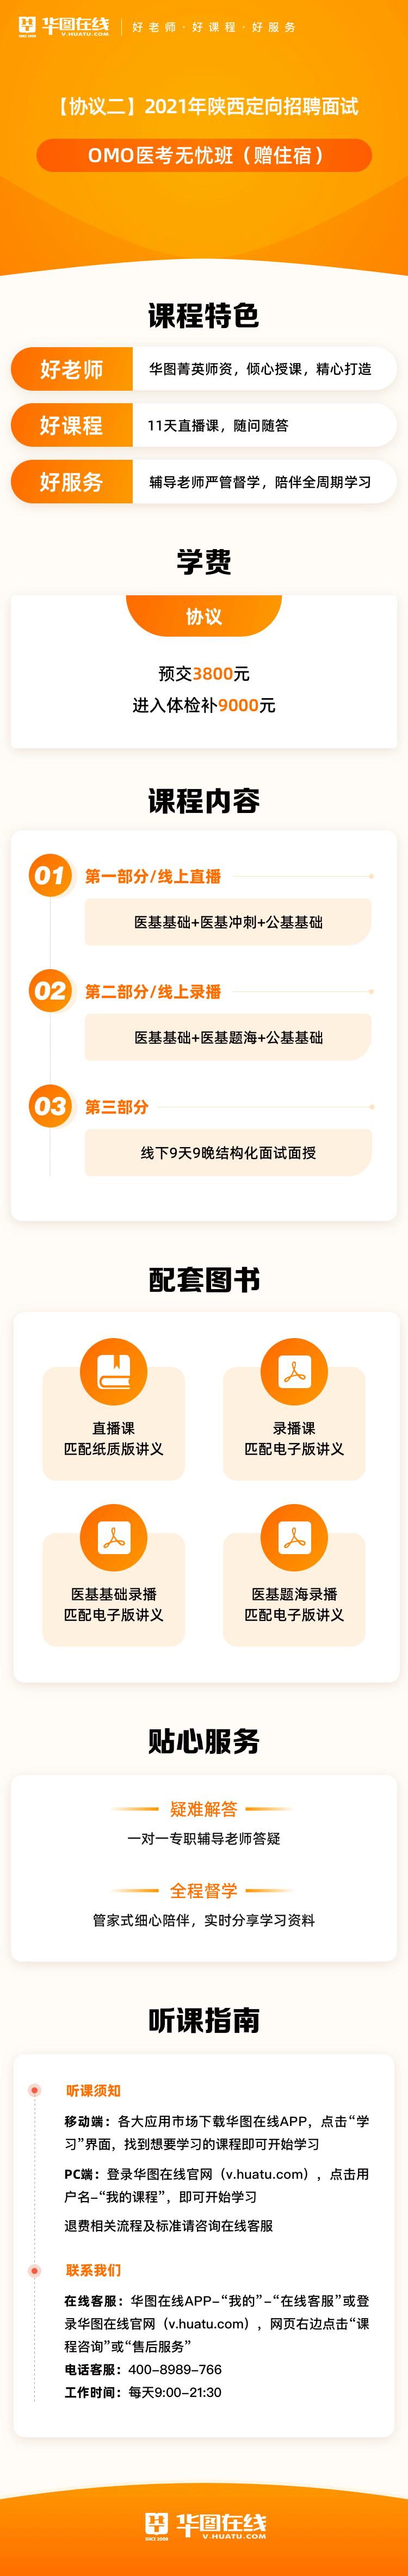 http://upload.htexam.com/userimg/1631873565.png